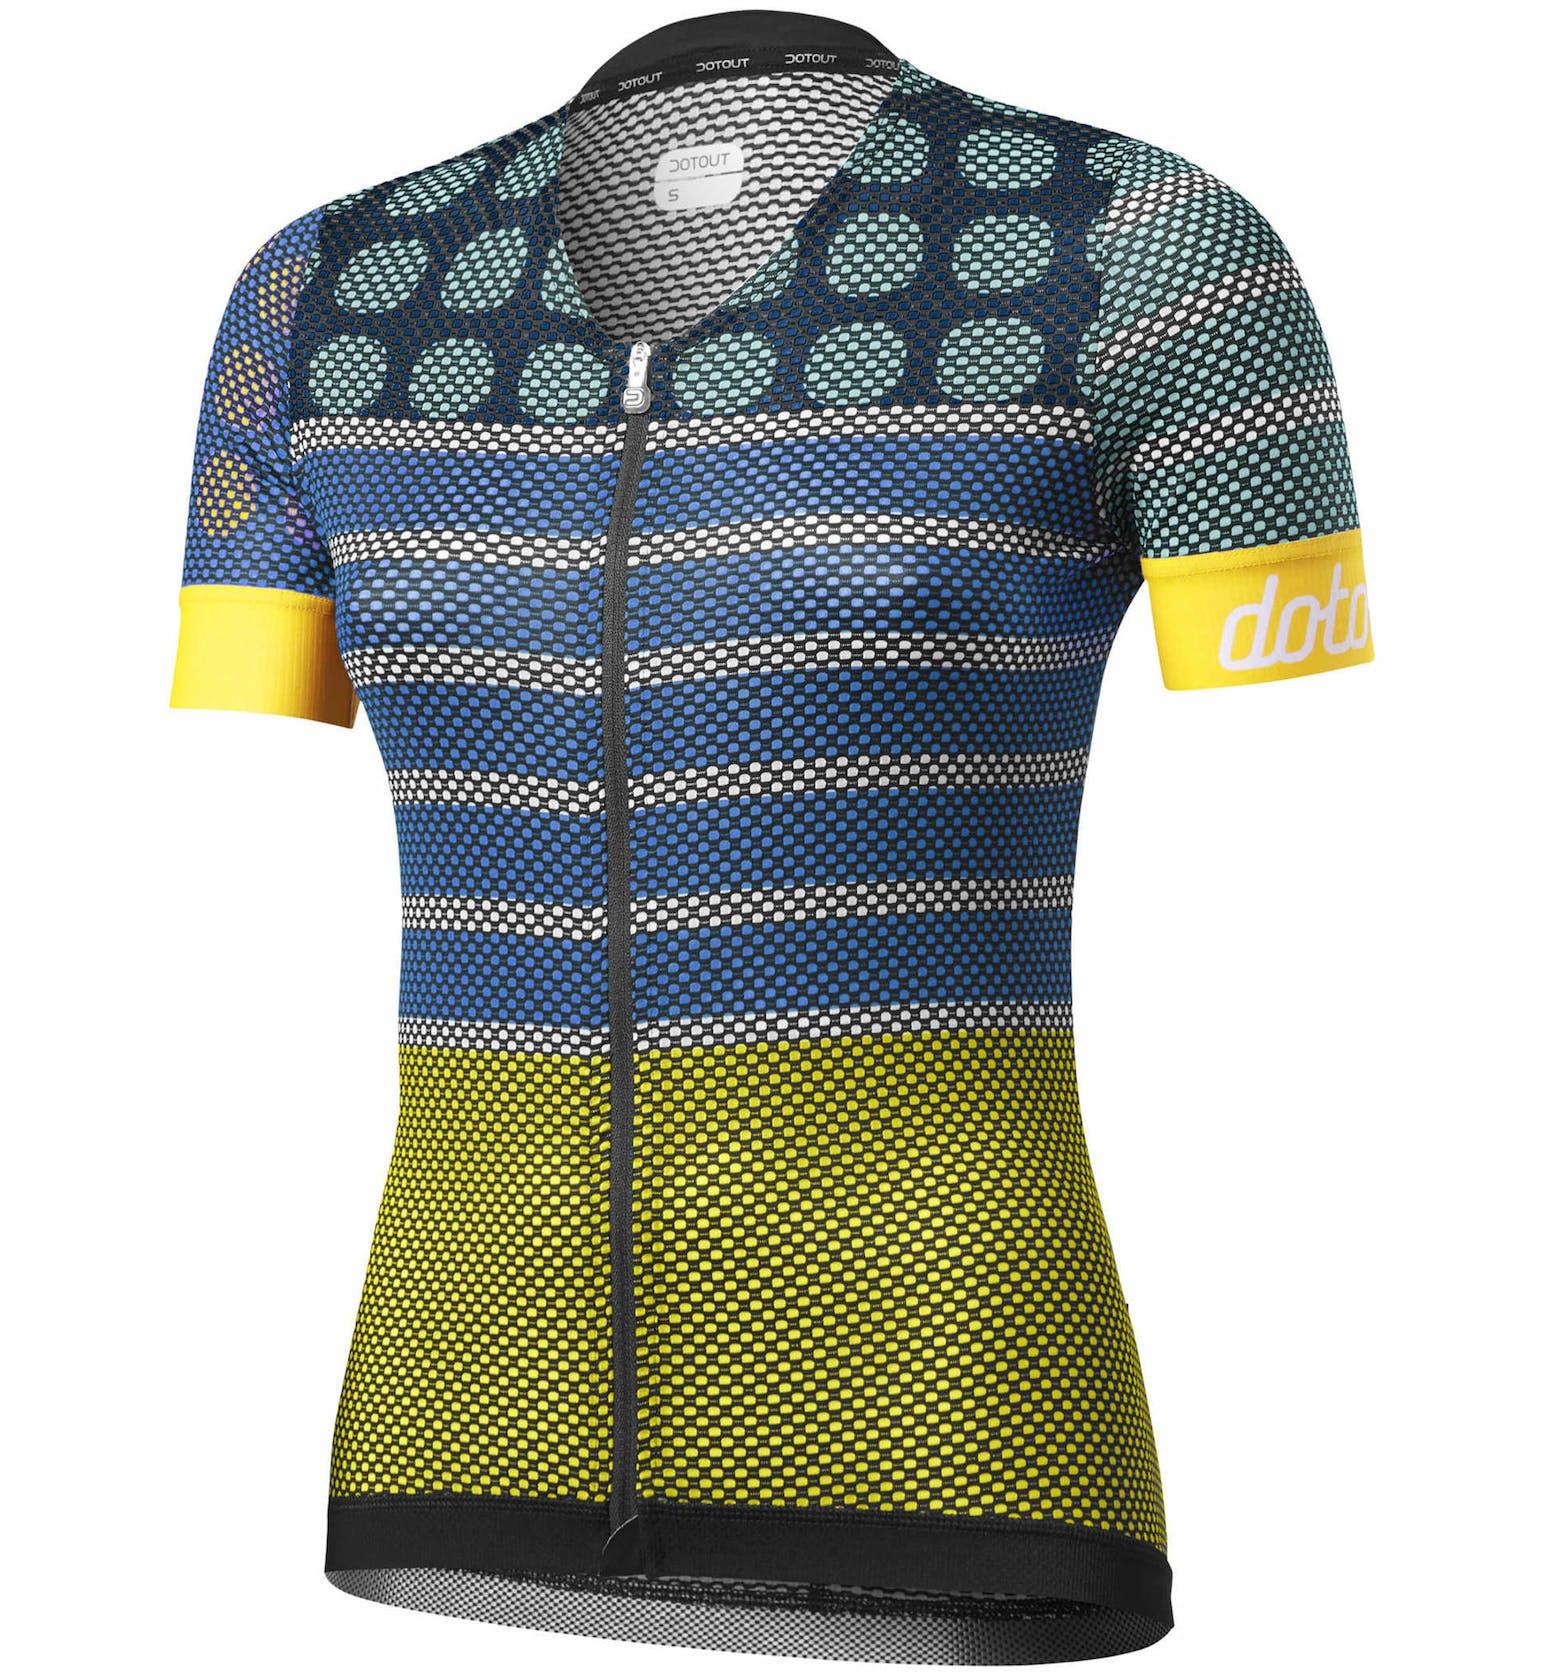 Dotout Dots - maglia bici - donna